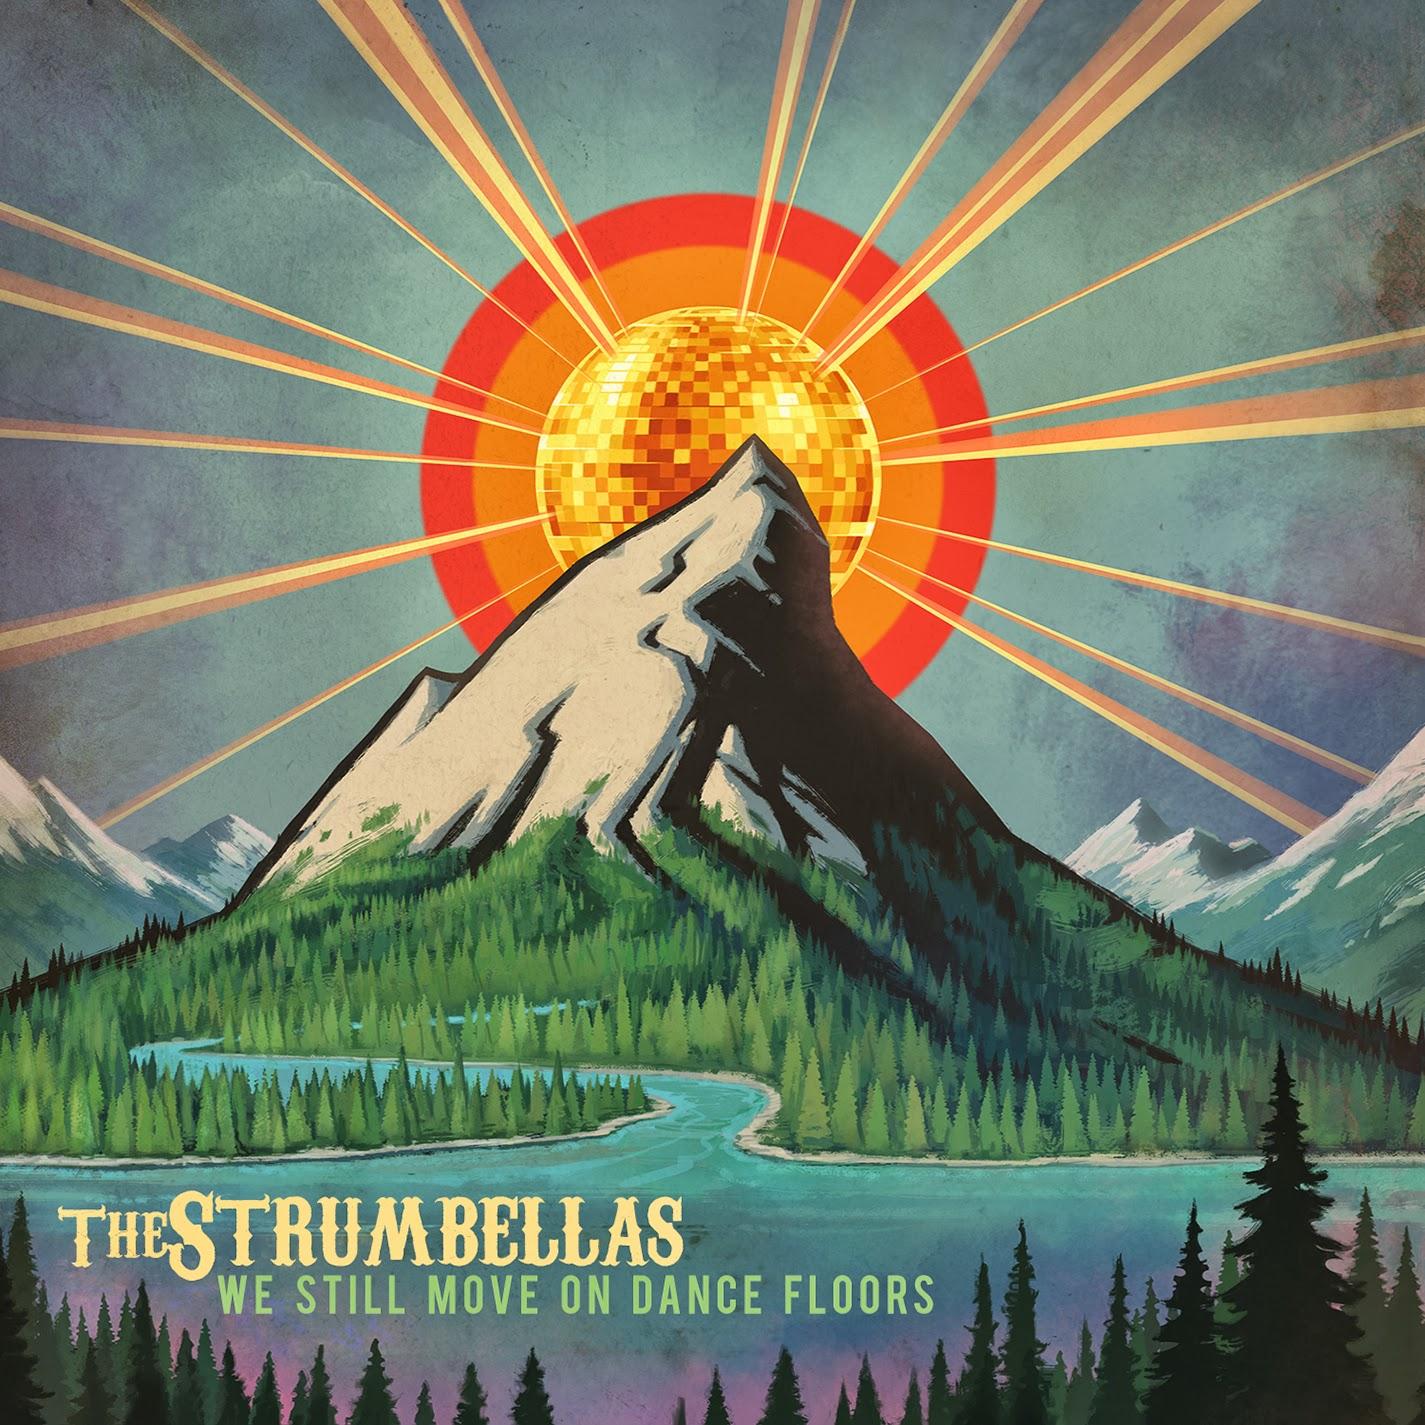 The-Strumbellas_We-Still-Move-On-Dance-Floors-Cover.jpg